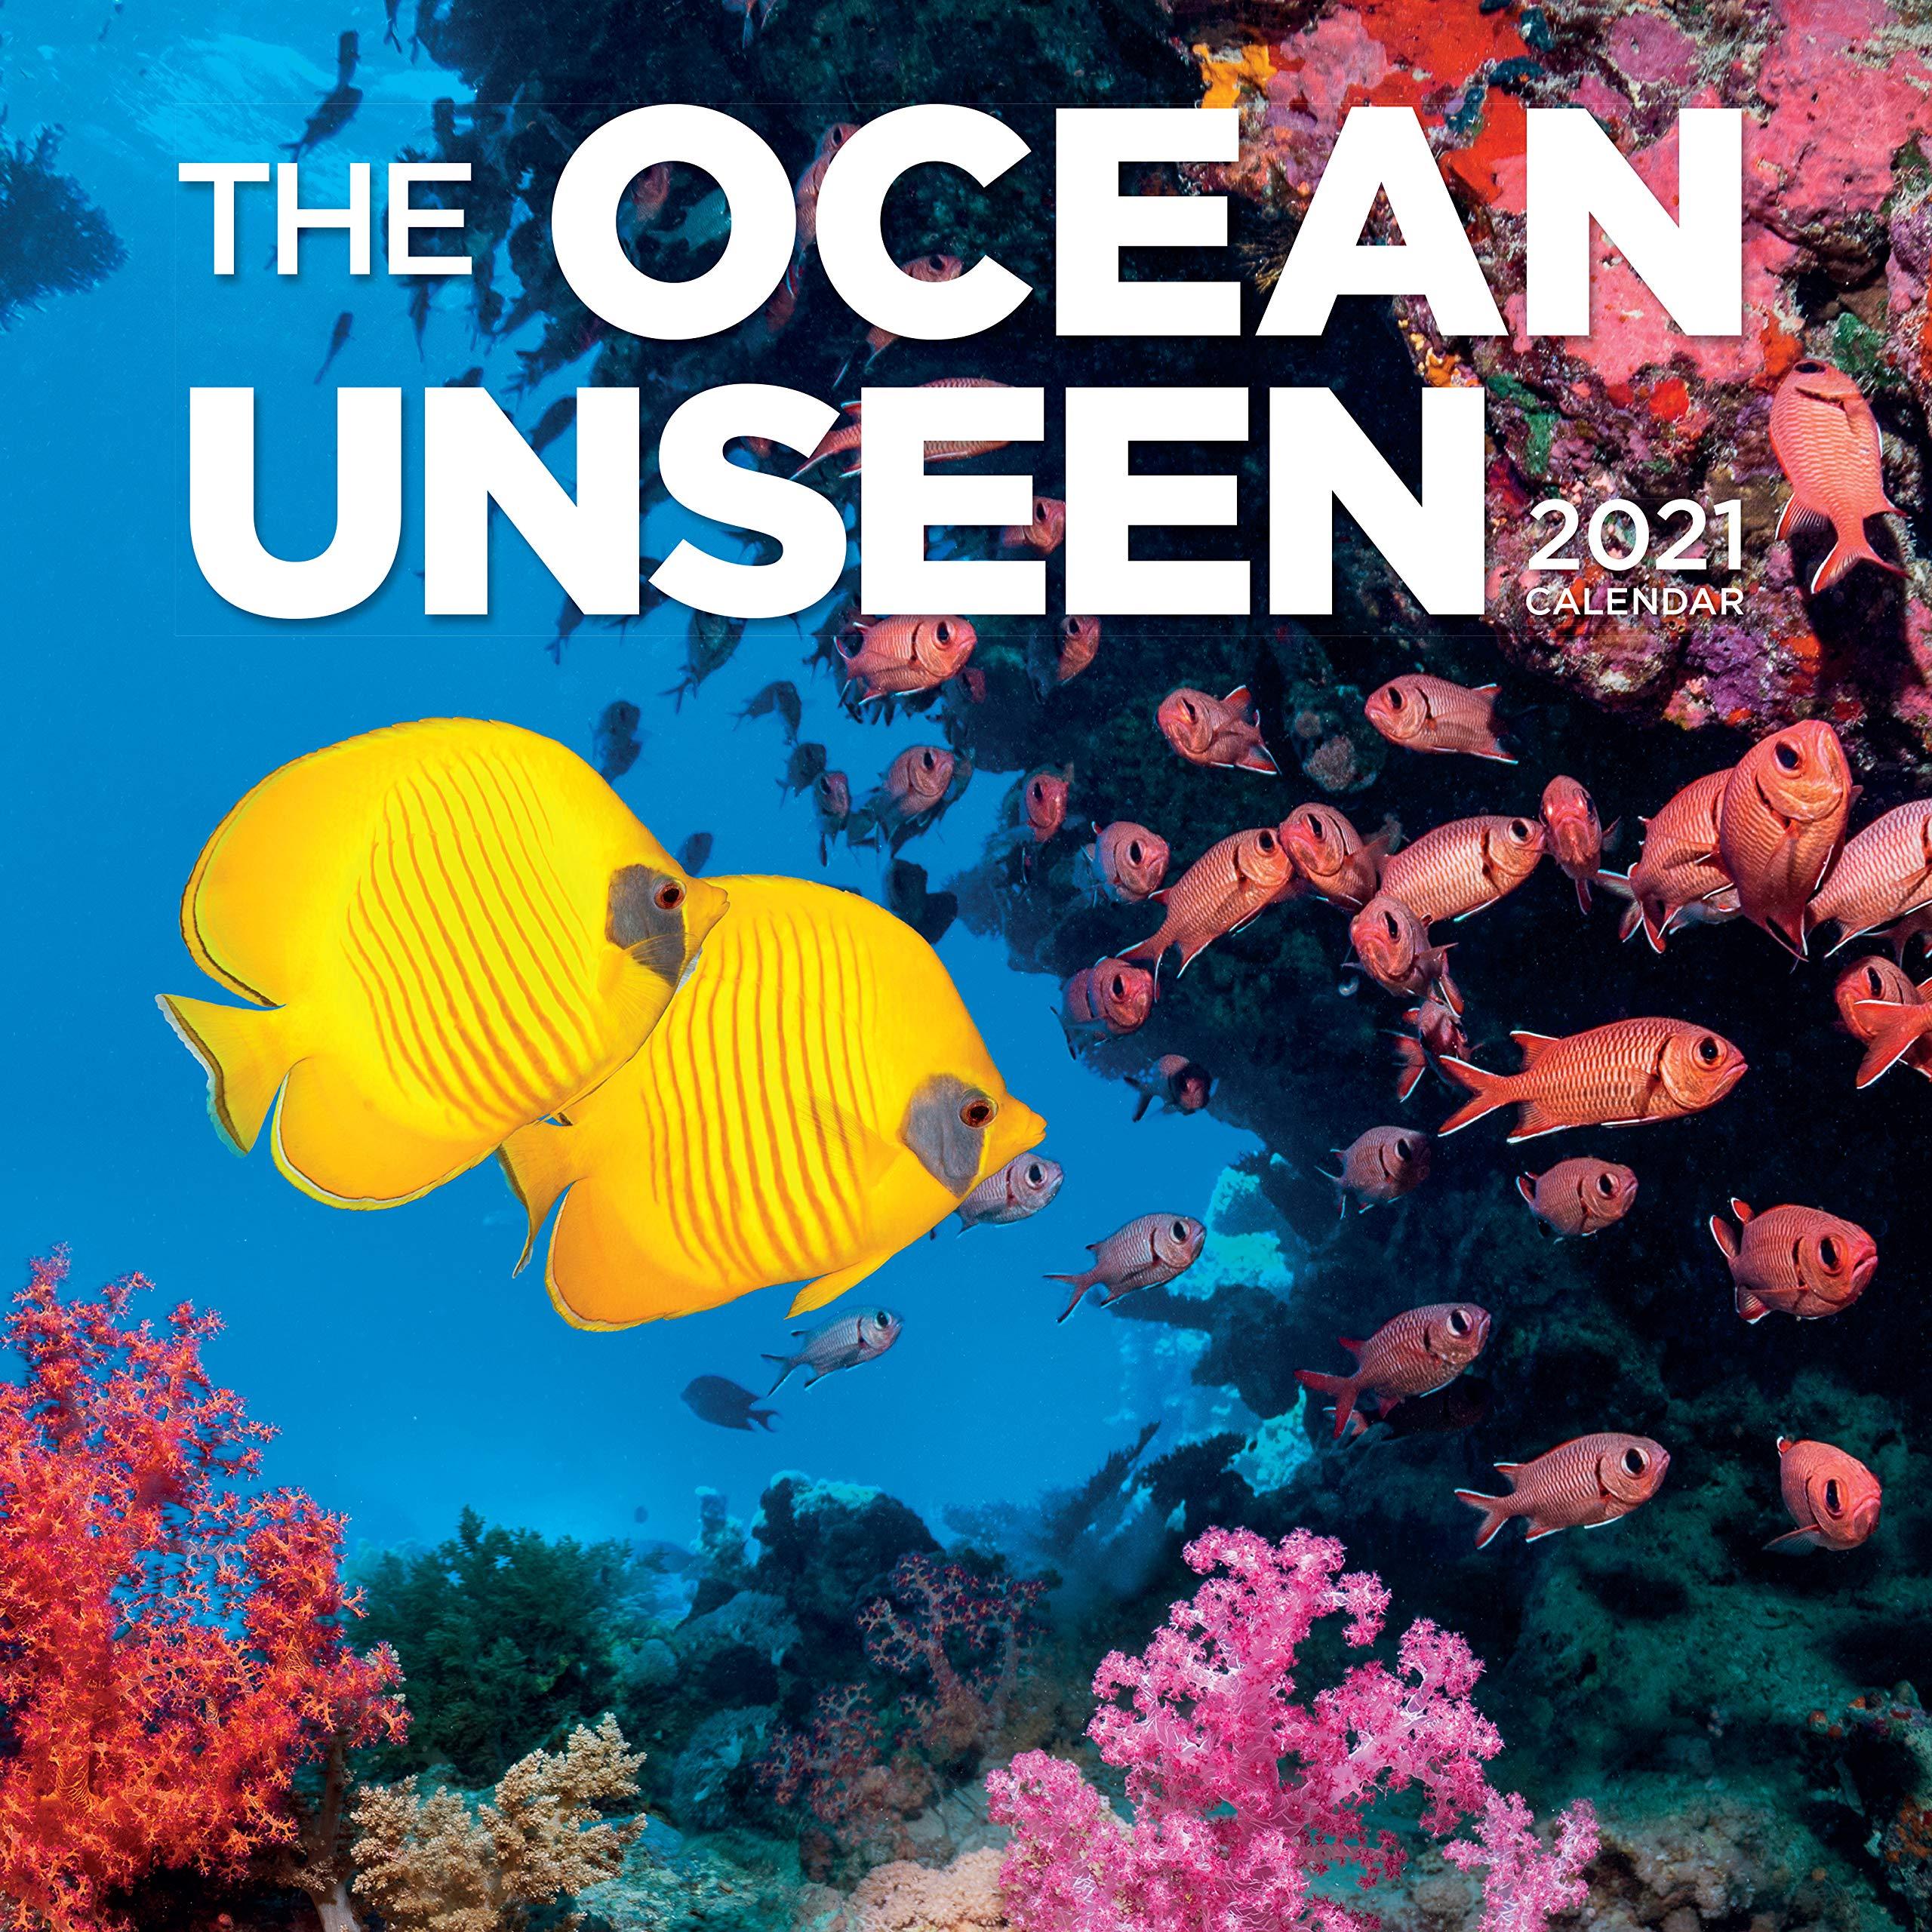 Reef Calendar 2021